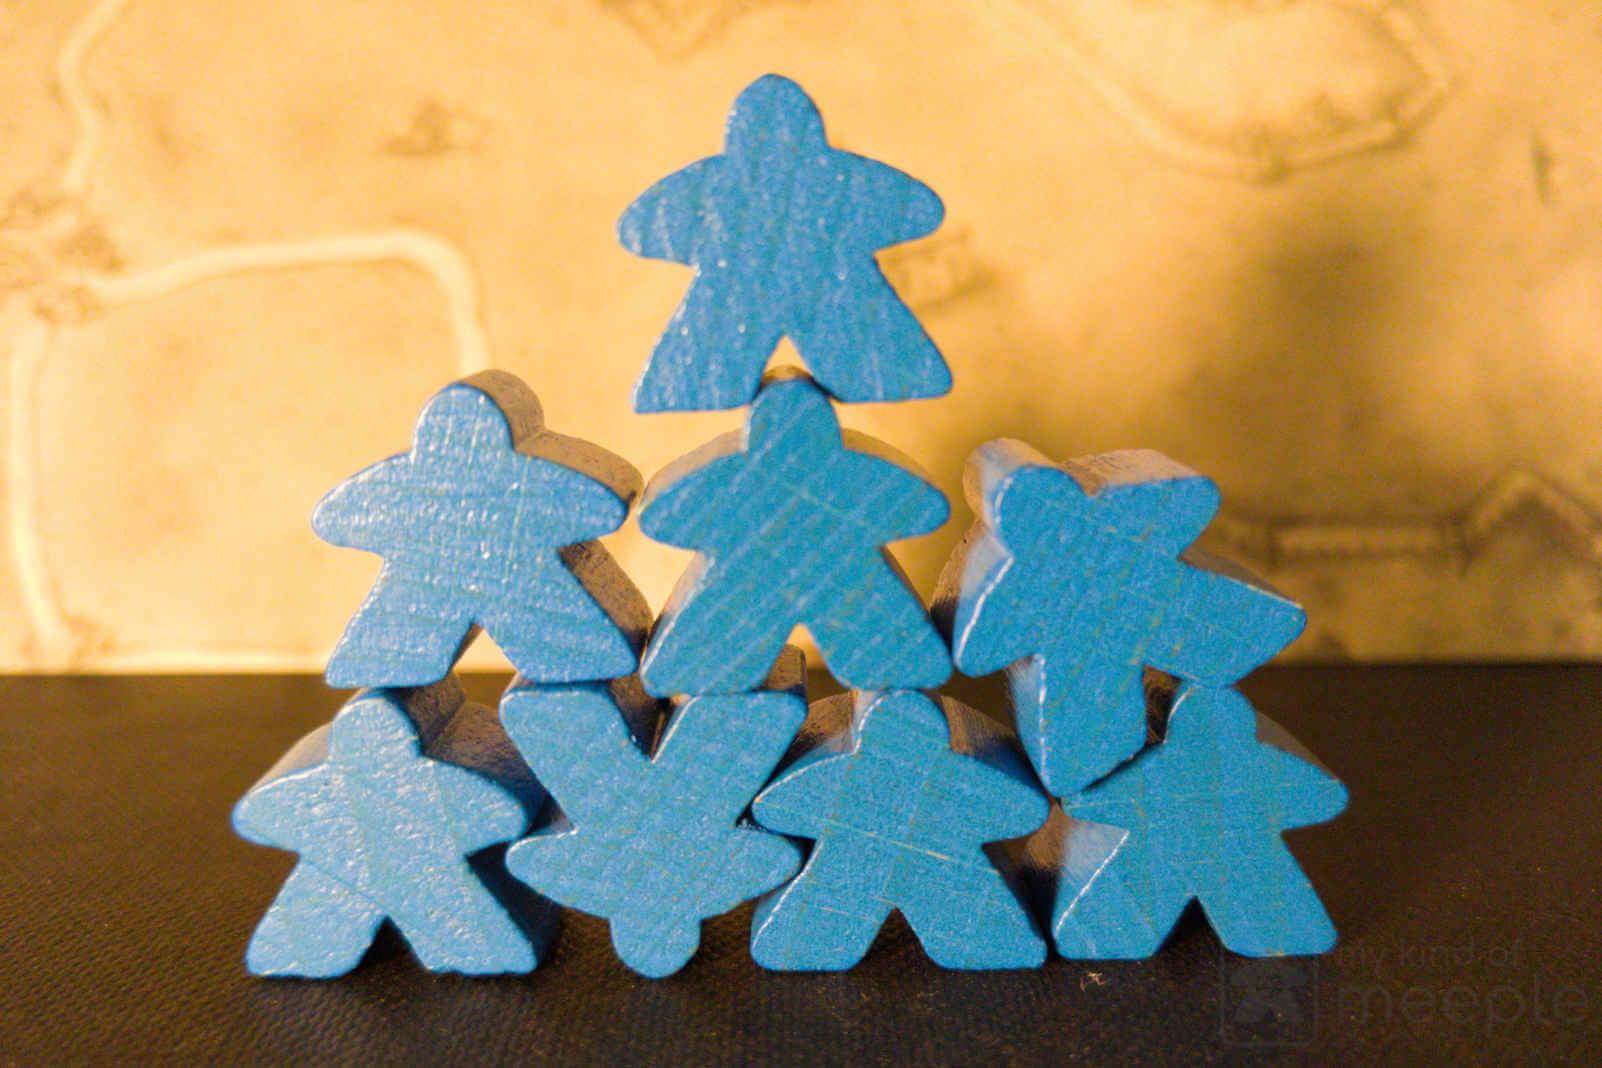 blue meeple stack